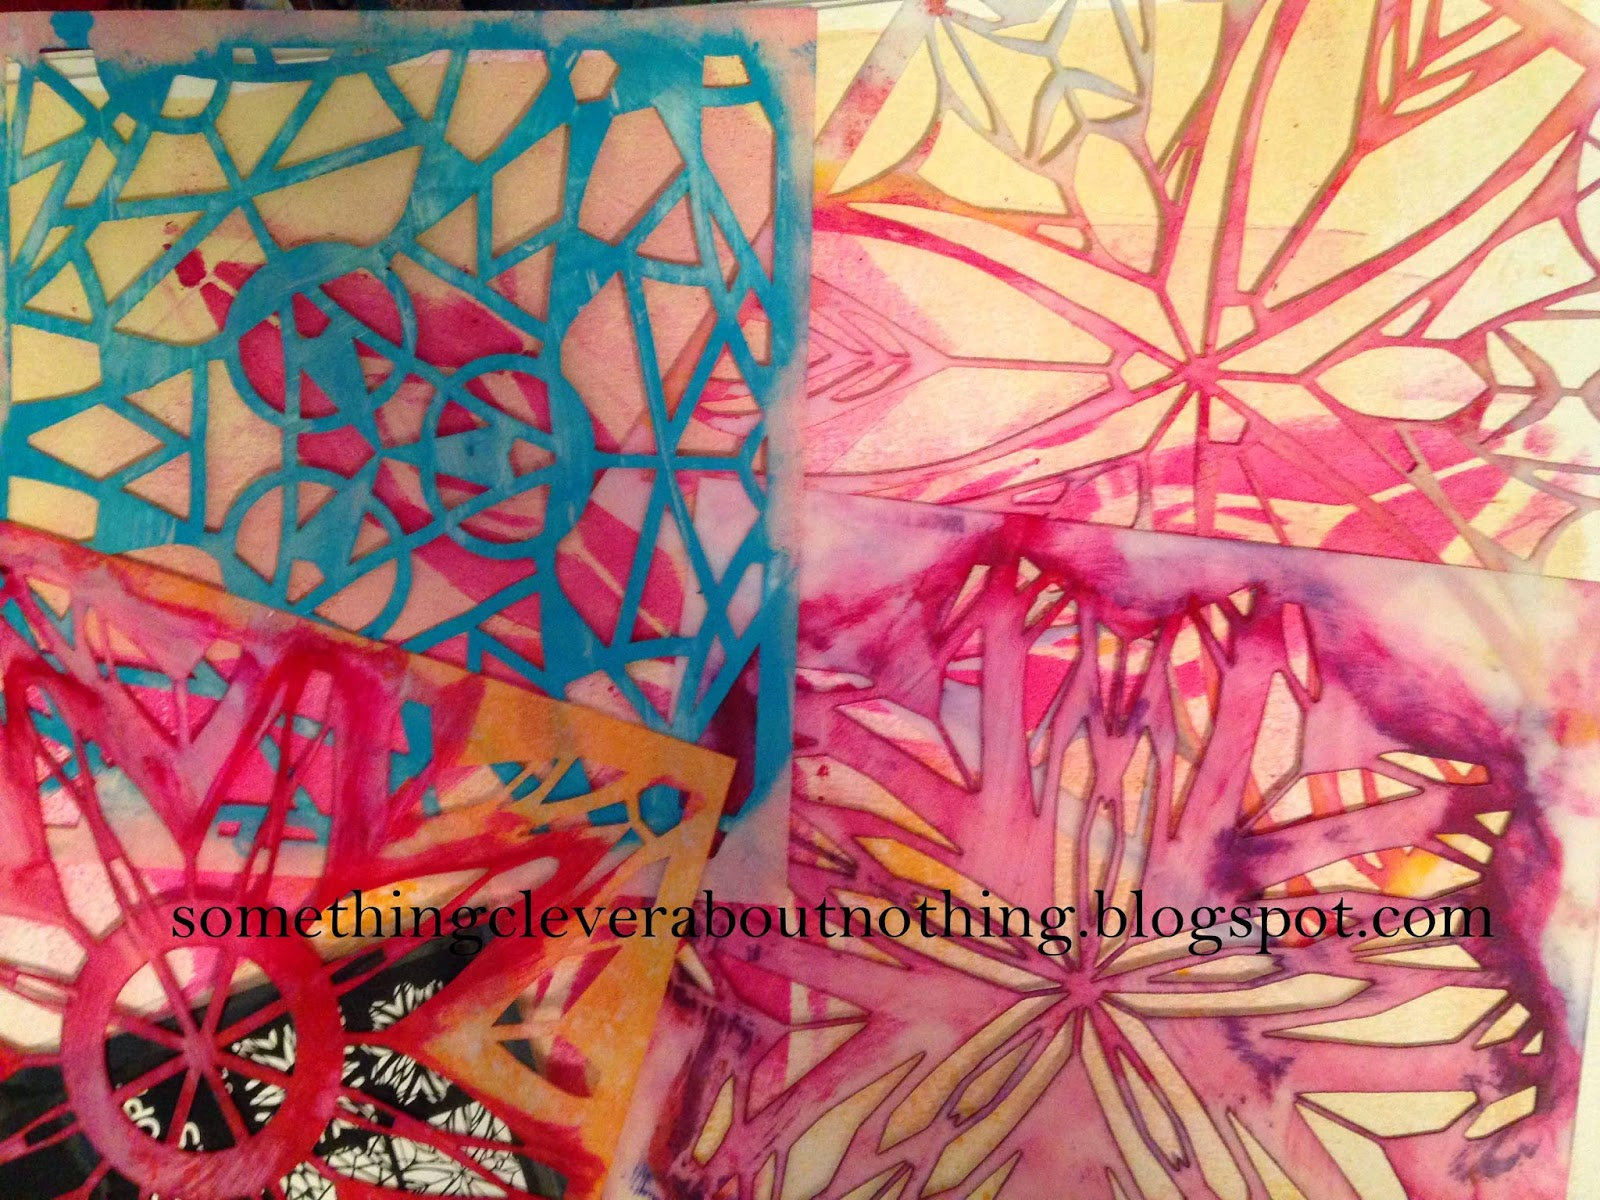 http://4.bp.blogspot.com/-GbXuFXG33OY/VE3mo6ZaGYI/AAAAAAAAPKg/7jBeP3M5DL4/s1600/Kaleidoscope%2Bstencils.jpg